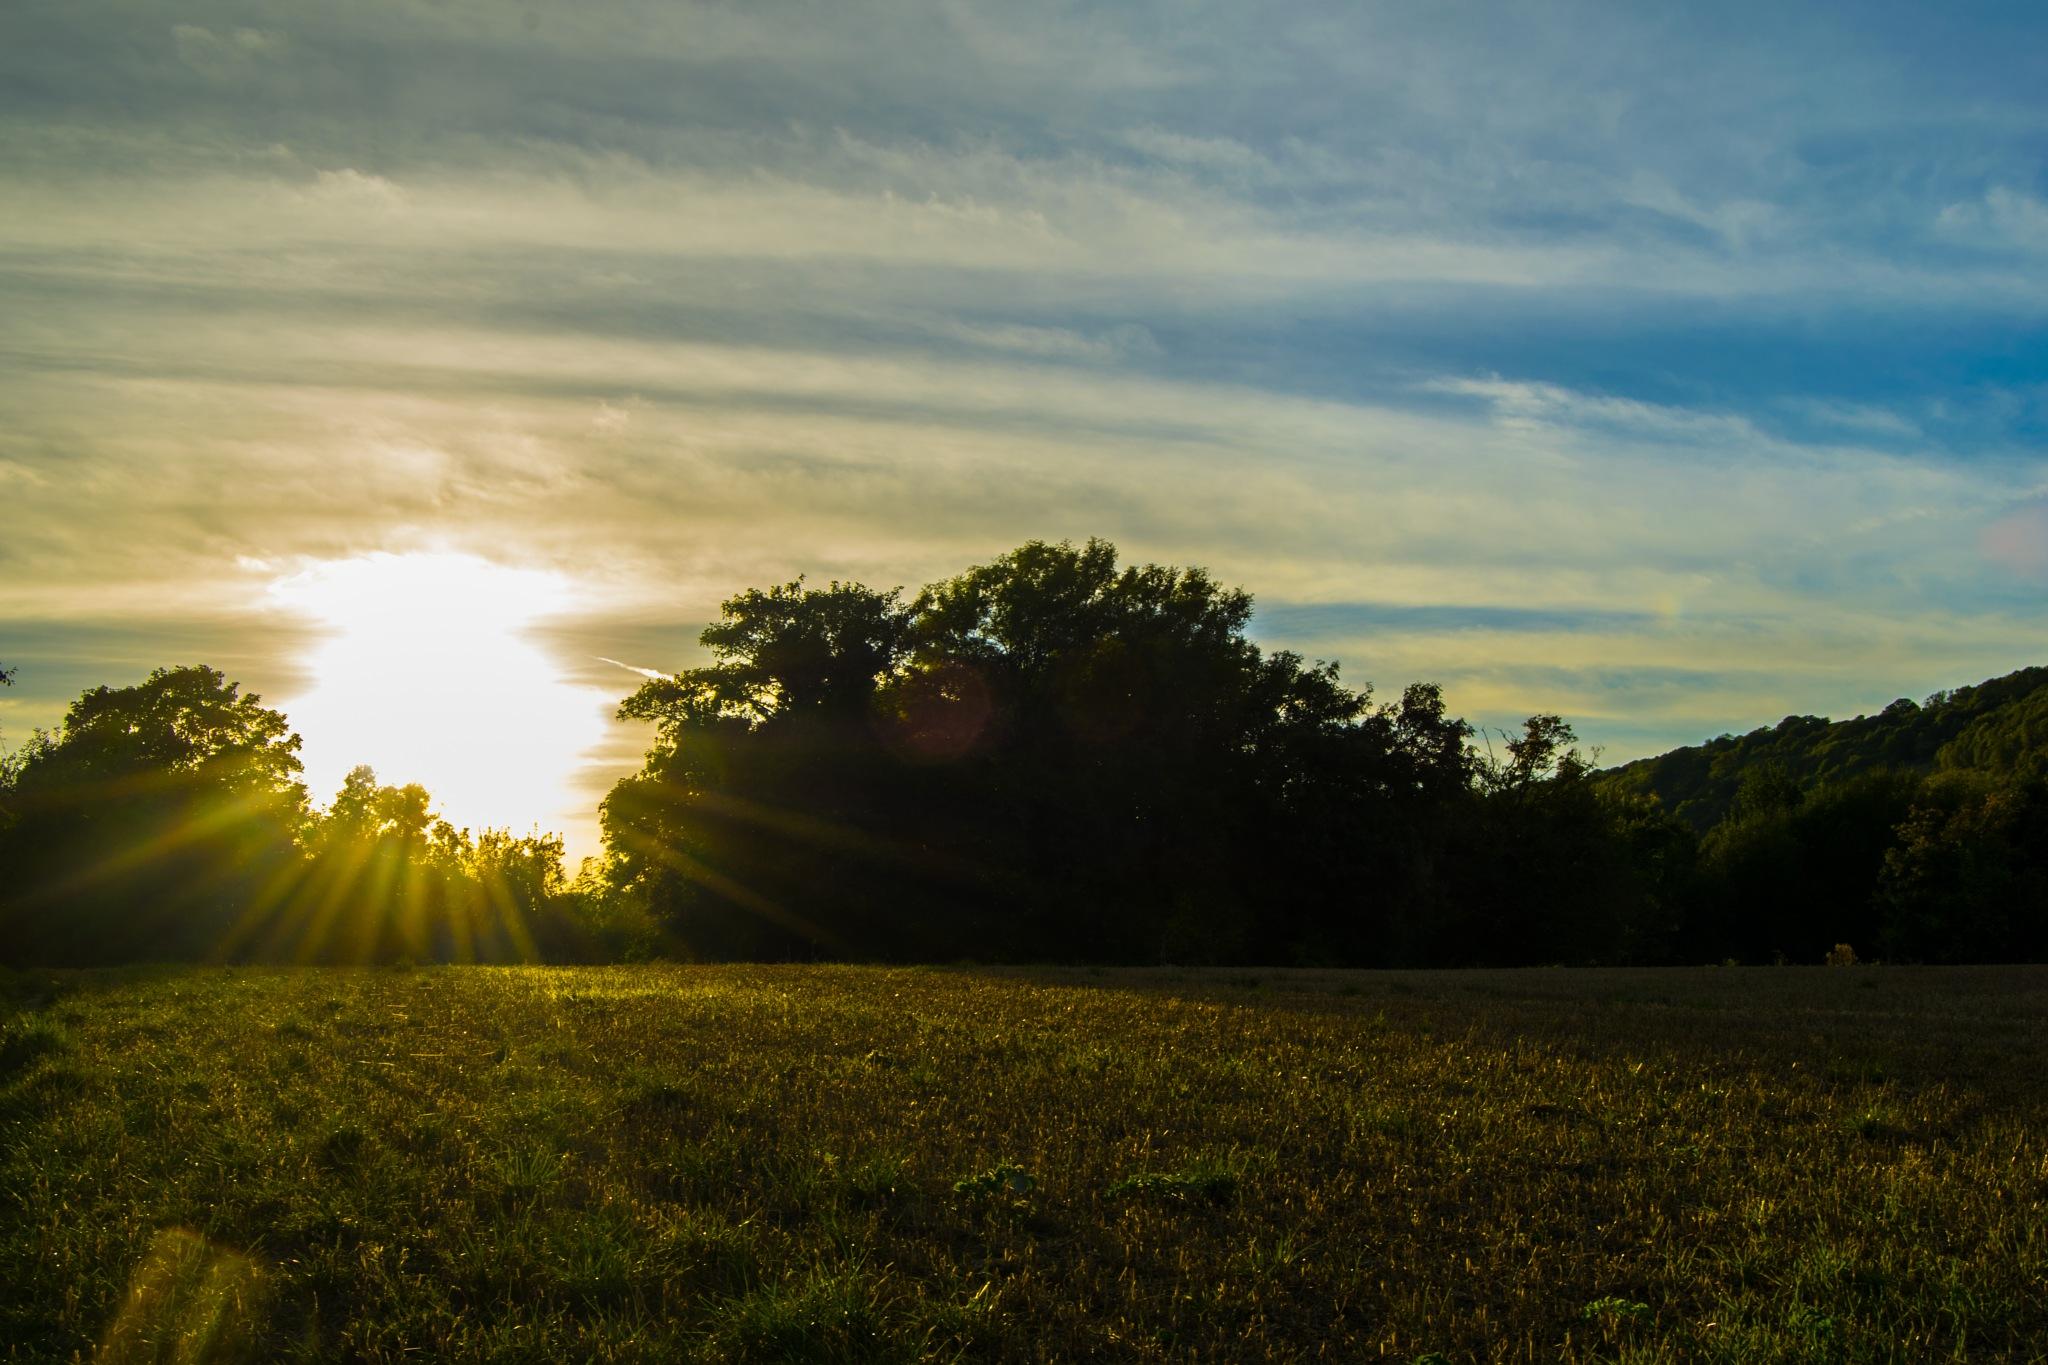 Fields by Sunset by Reece Johnson